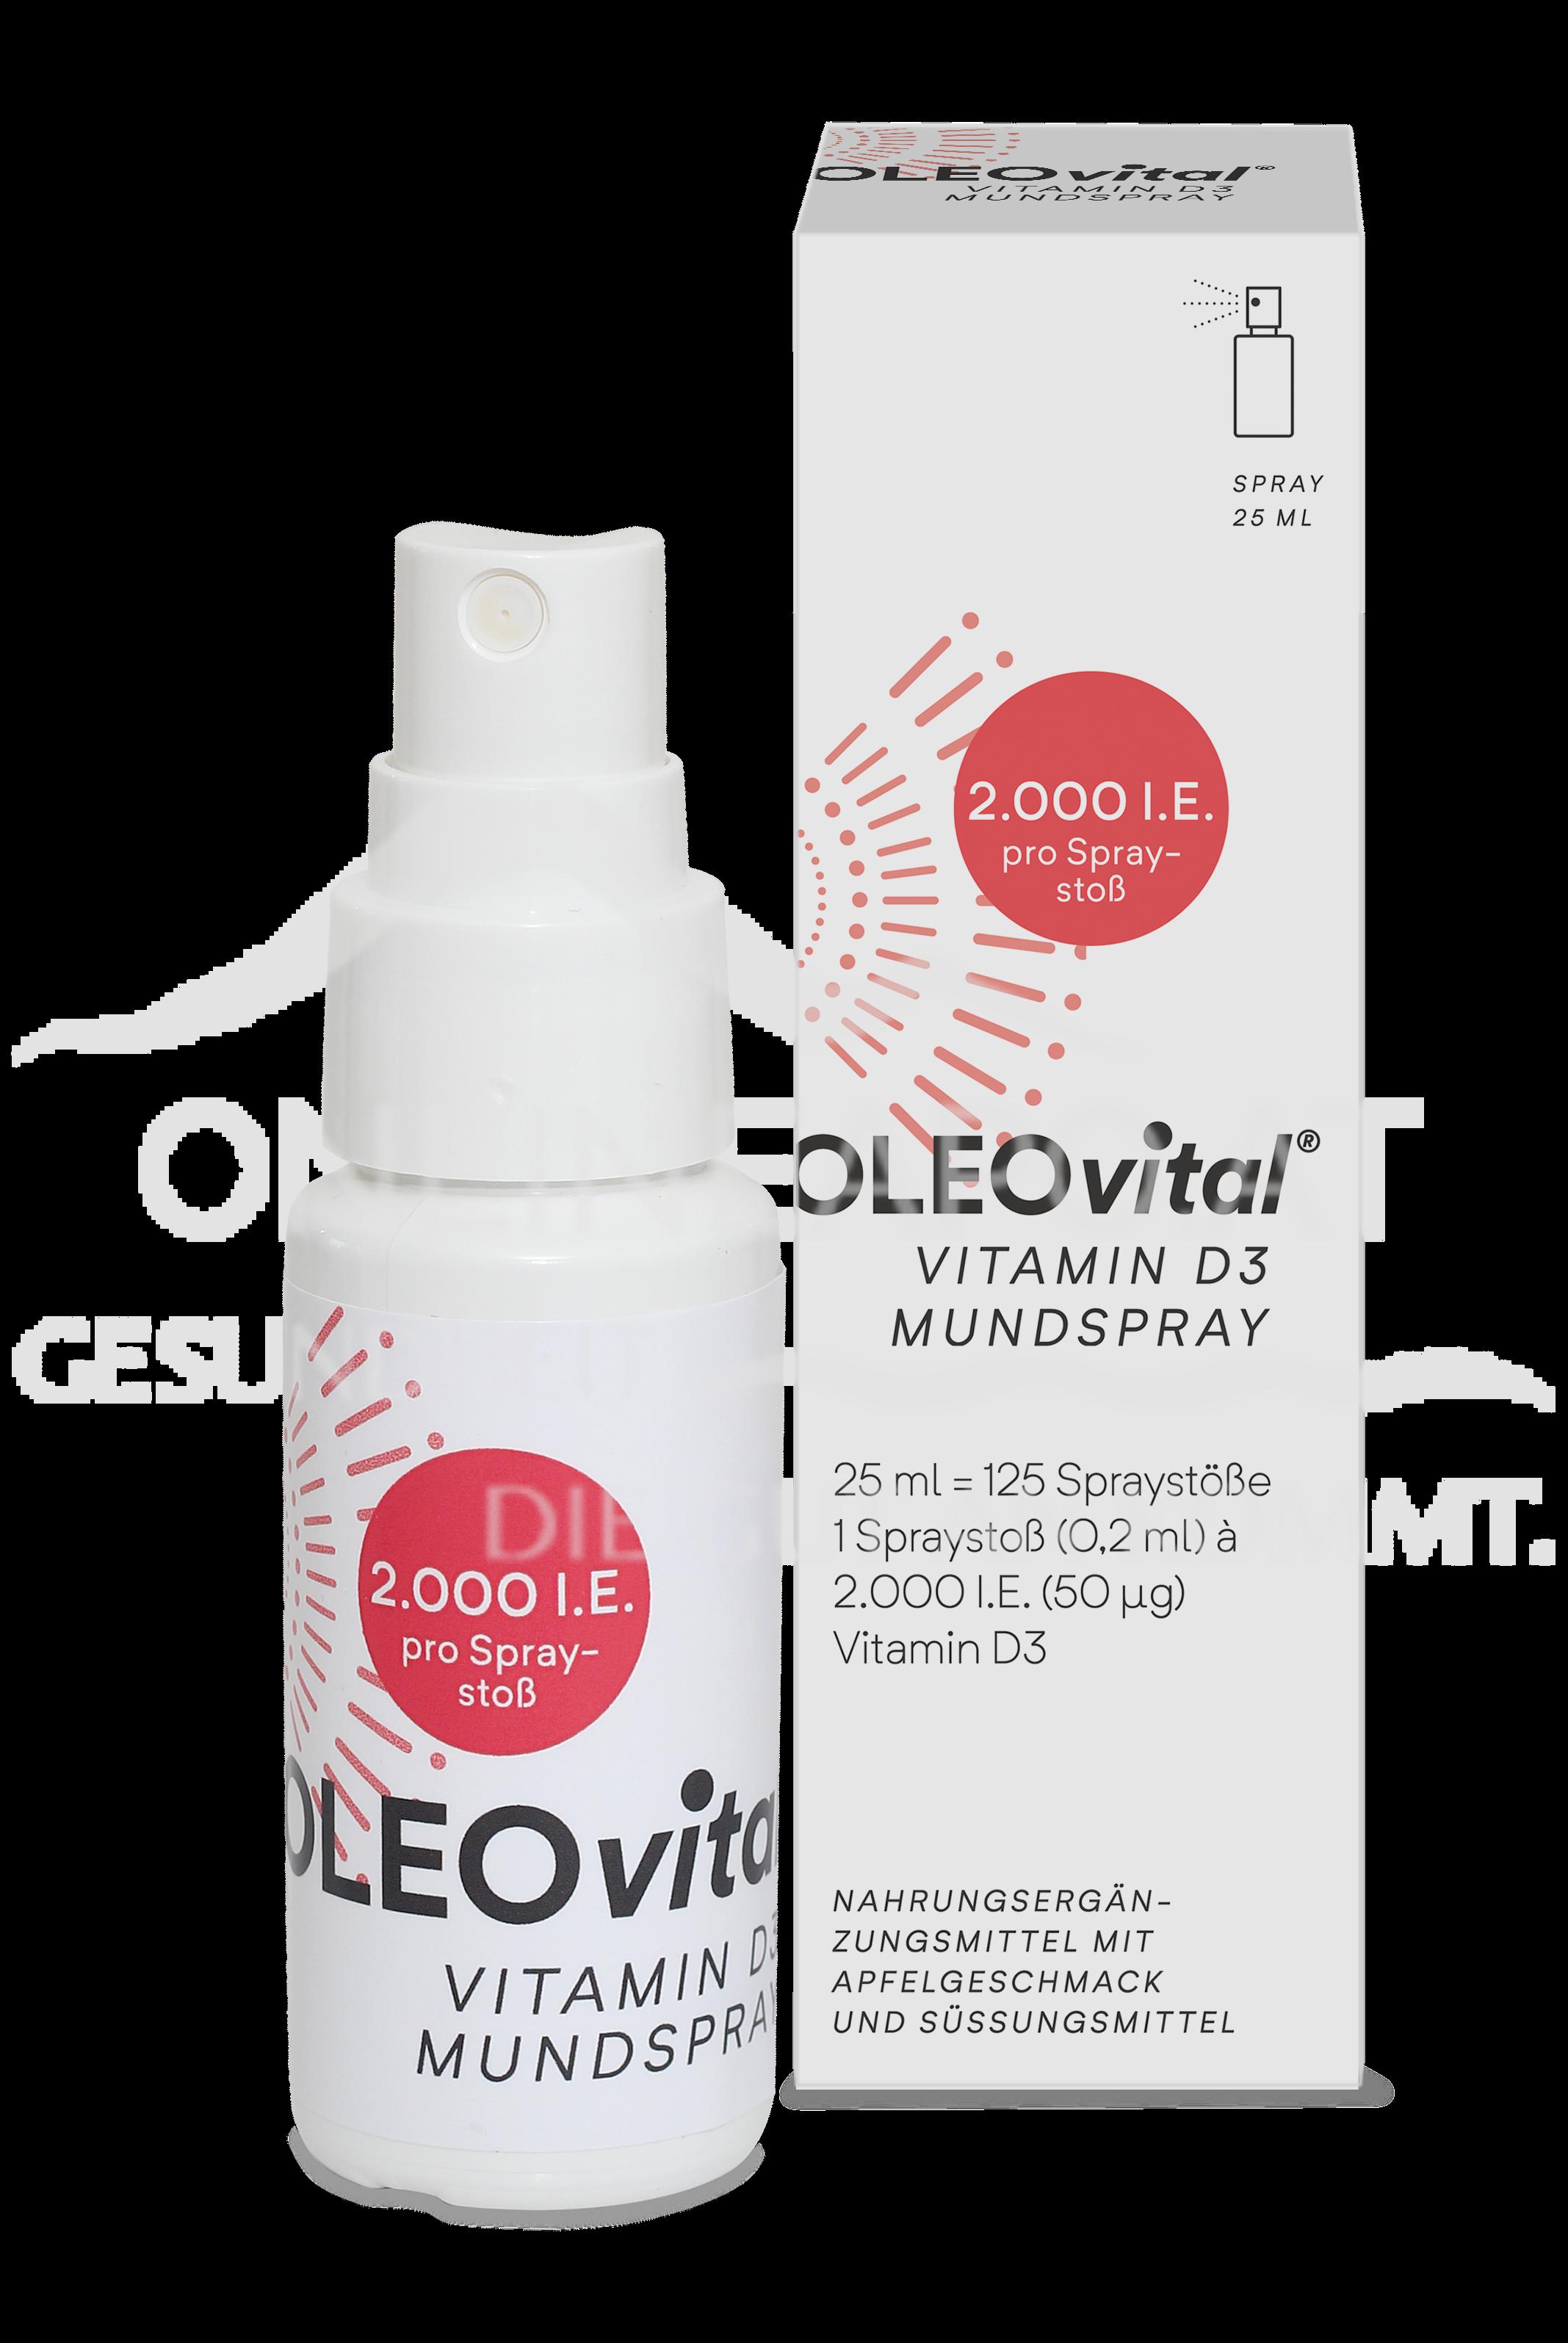 OLEOvital® VITAMIN D3 Mundspray  (2.000 I.E.)